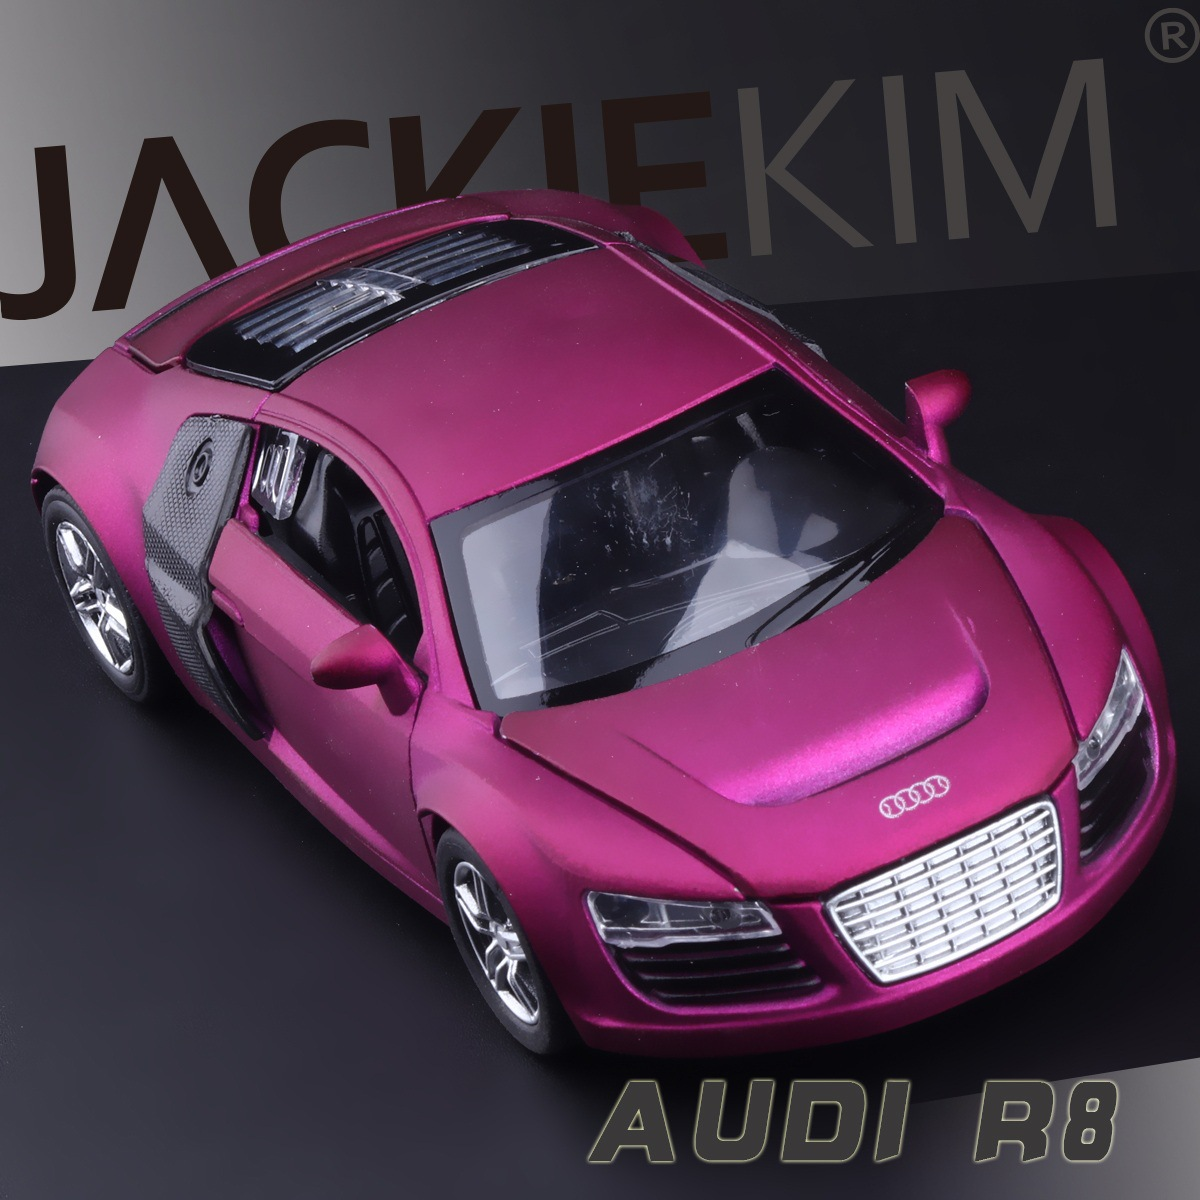 online buy wholesale audi r8 model car from china audi r8. Black Bedroom Furniture Sets. Home Design Ideas